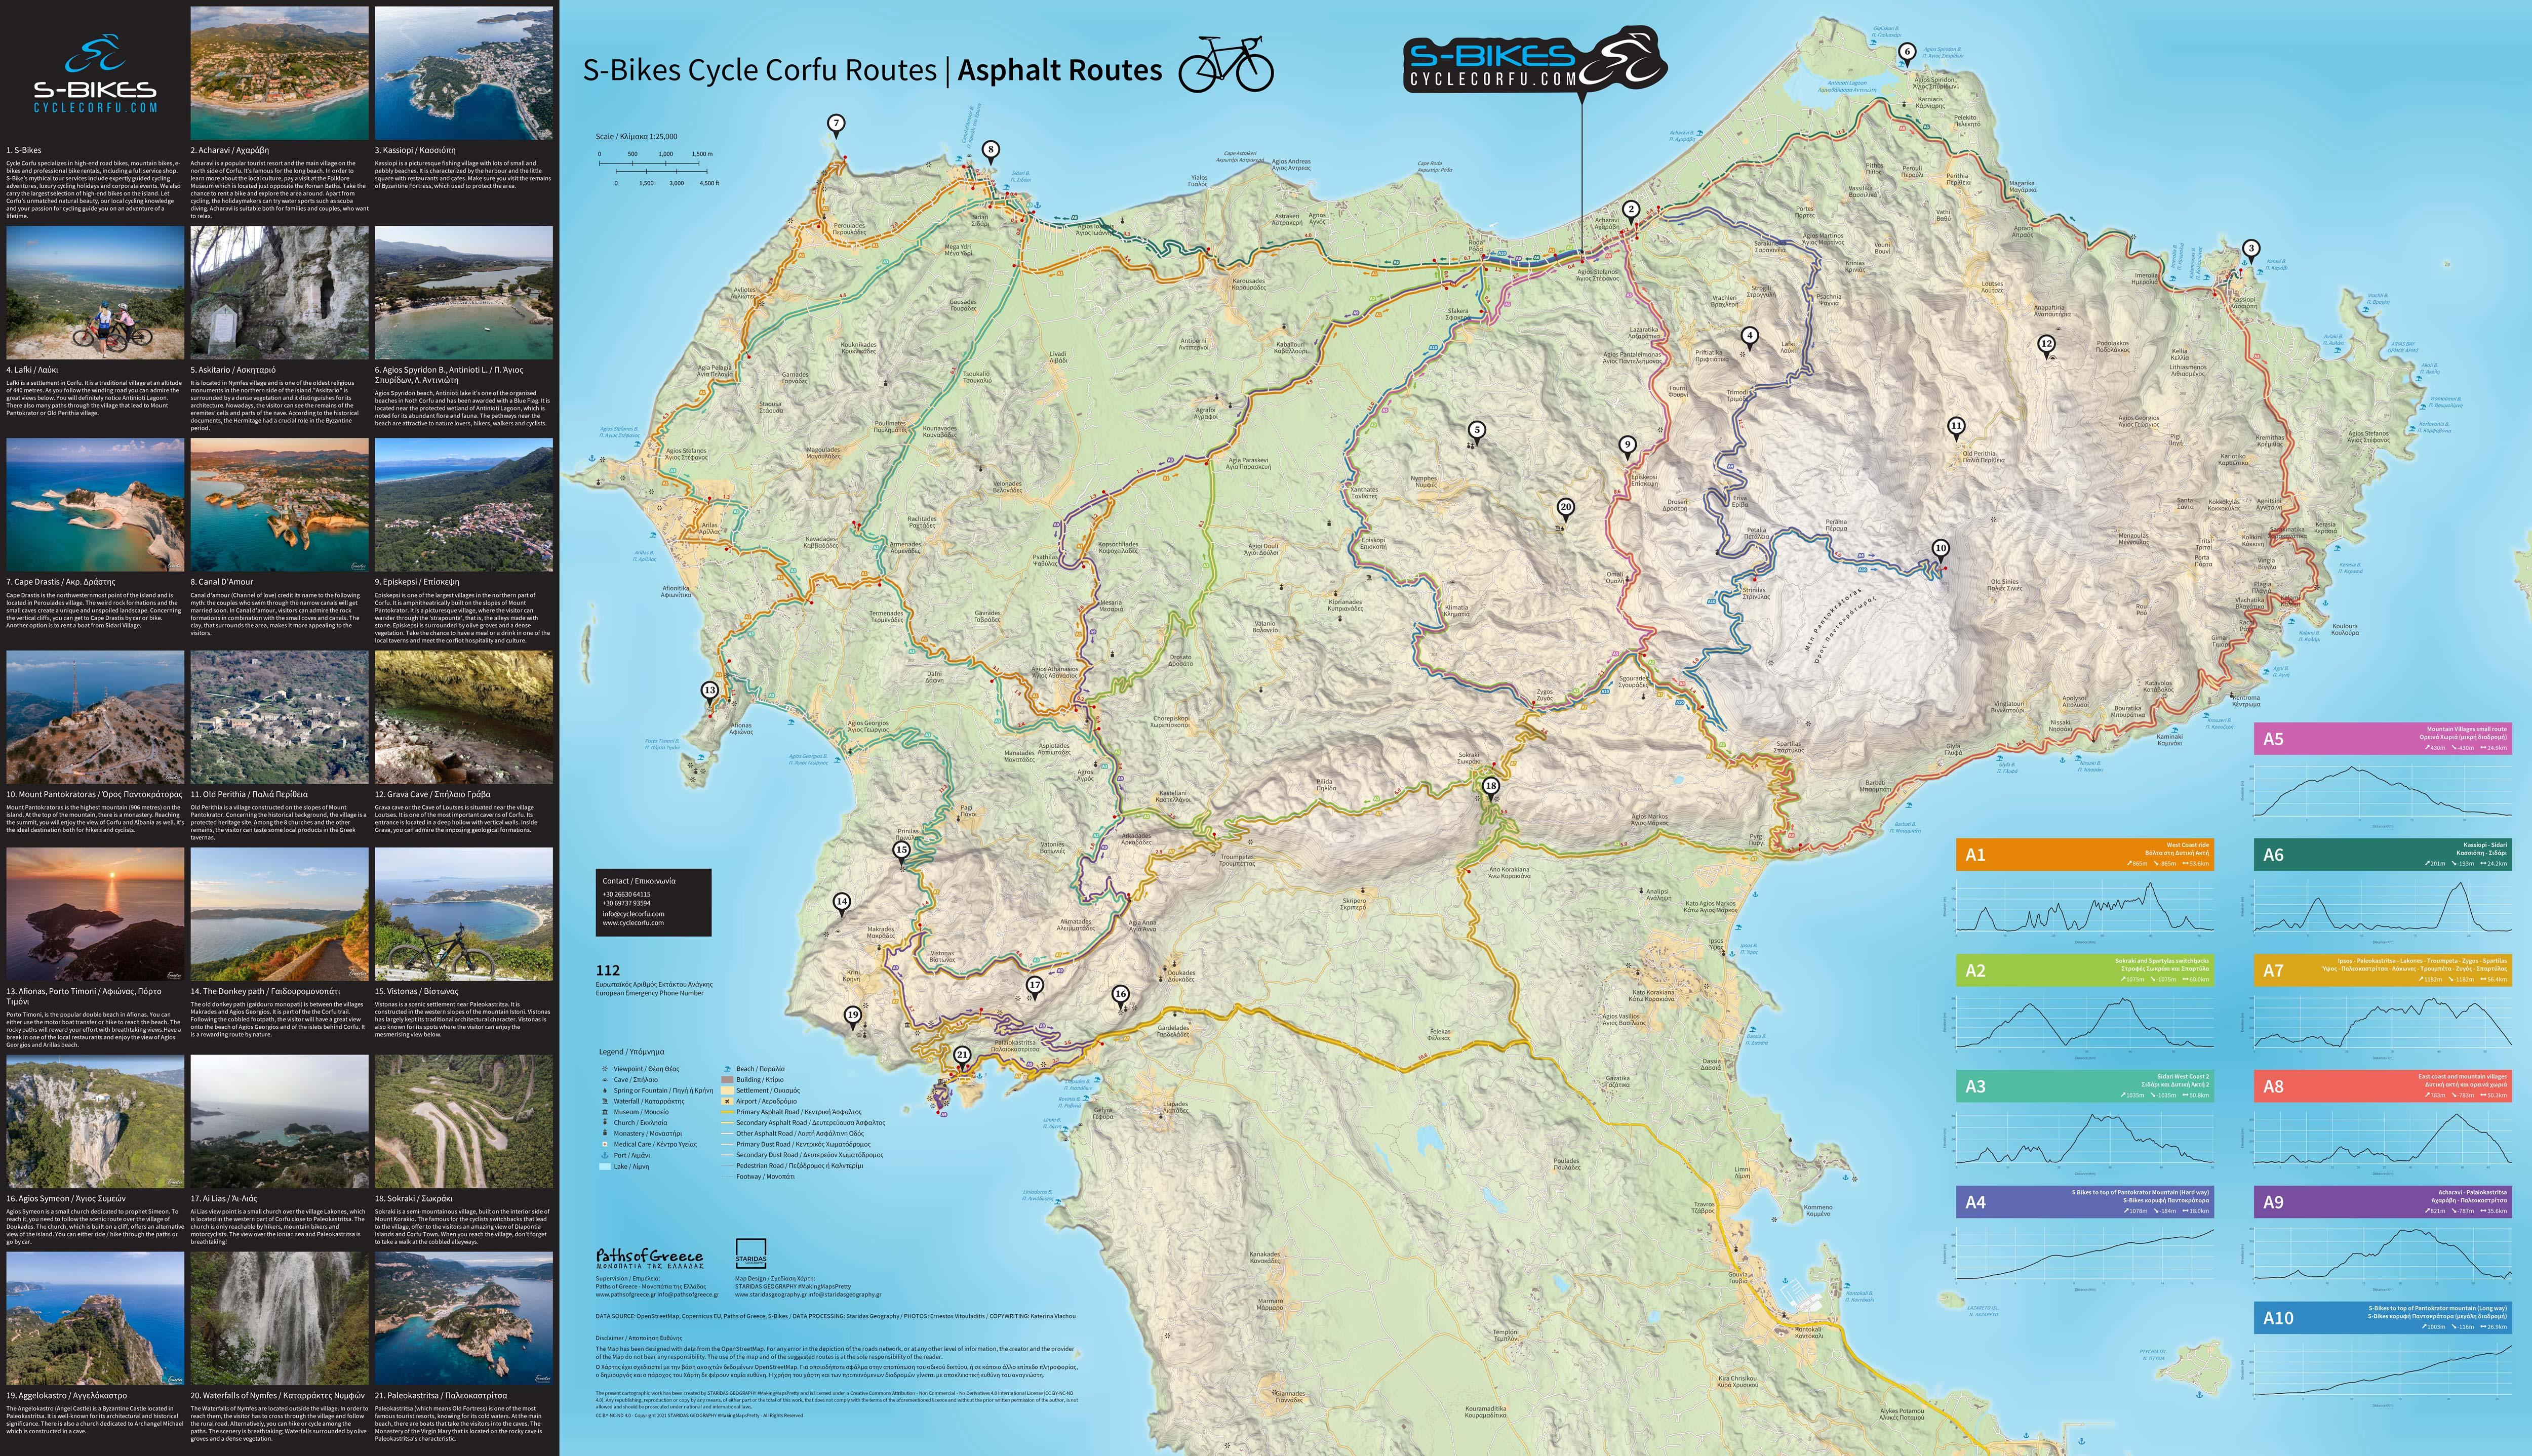 S-Bikes Cycle Corfu - Asphalt Routes